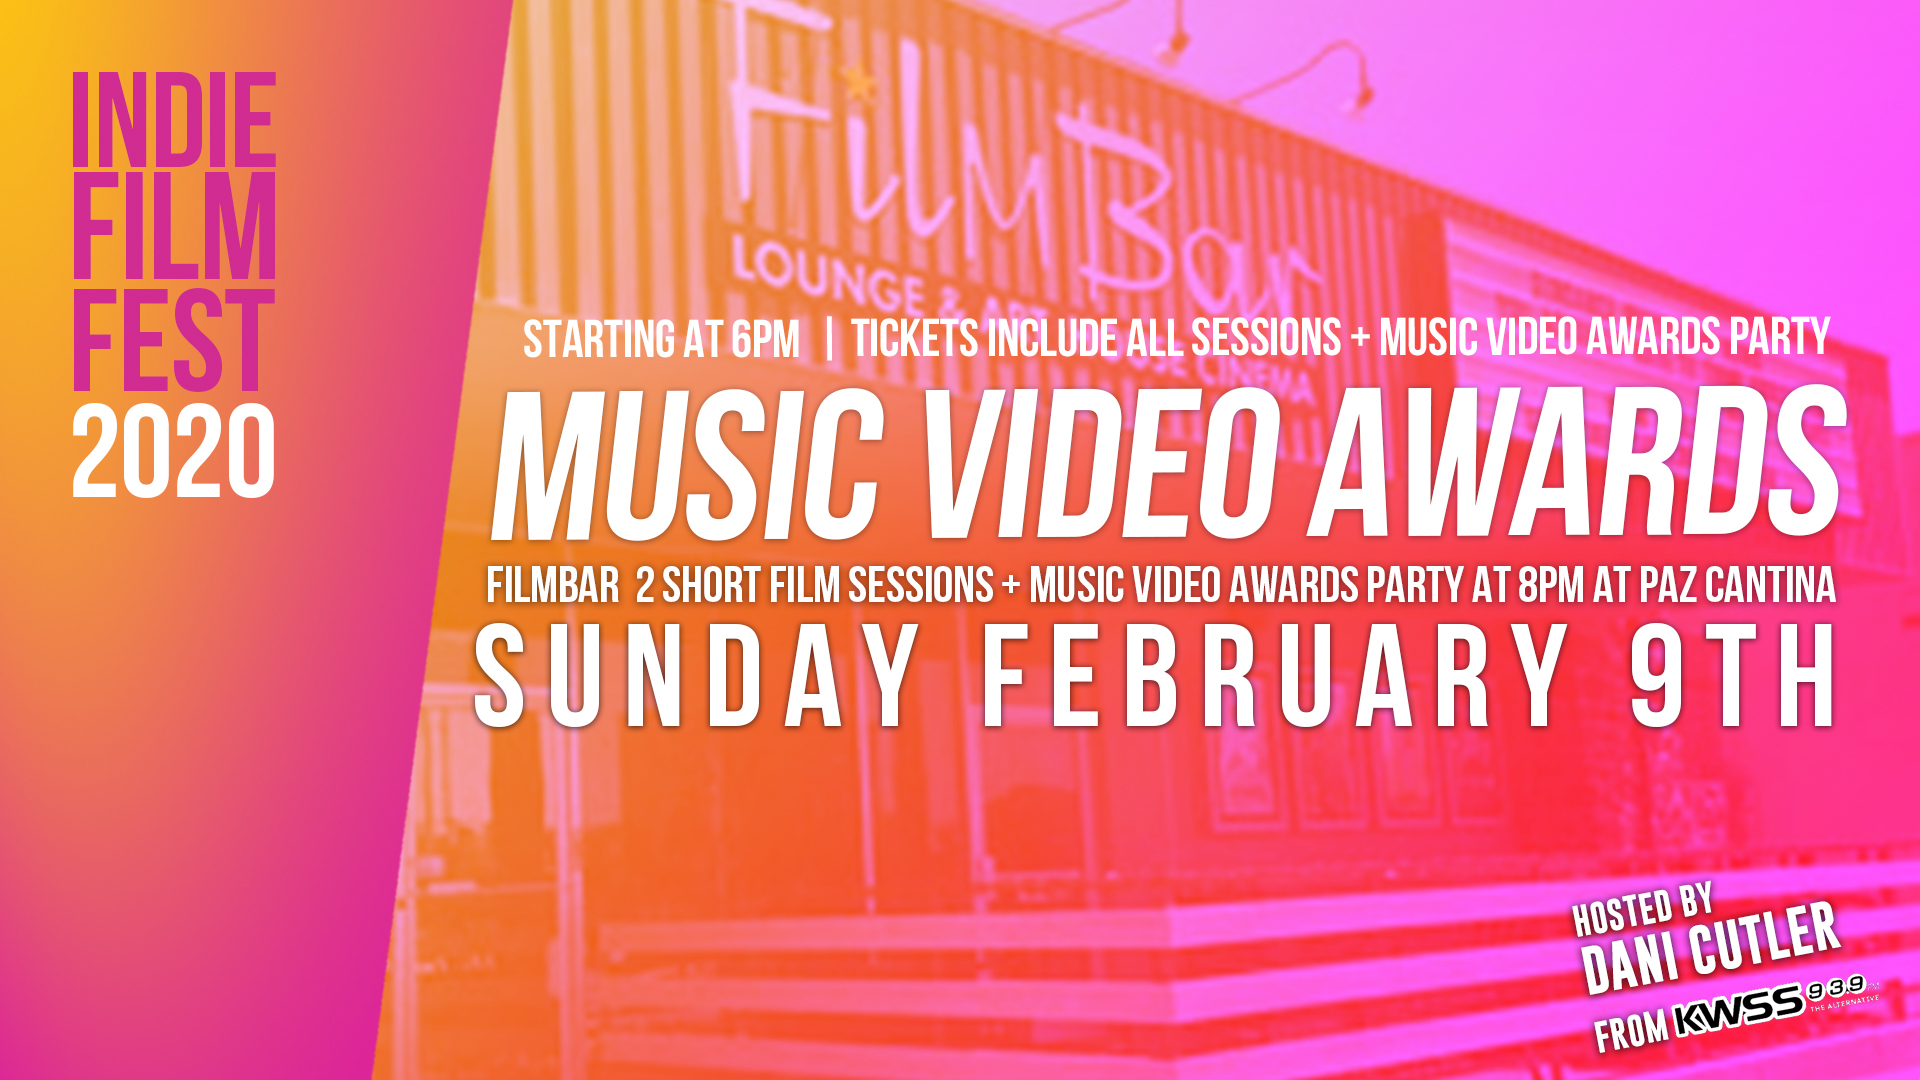 musicvideoawards